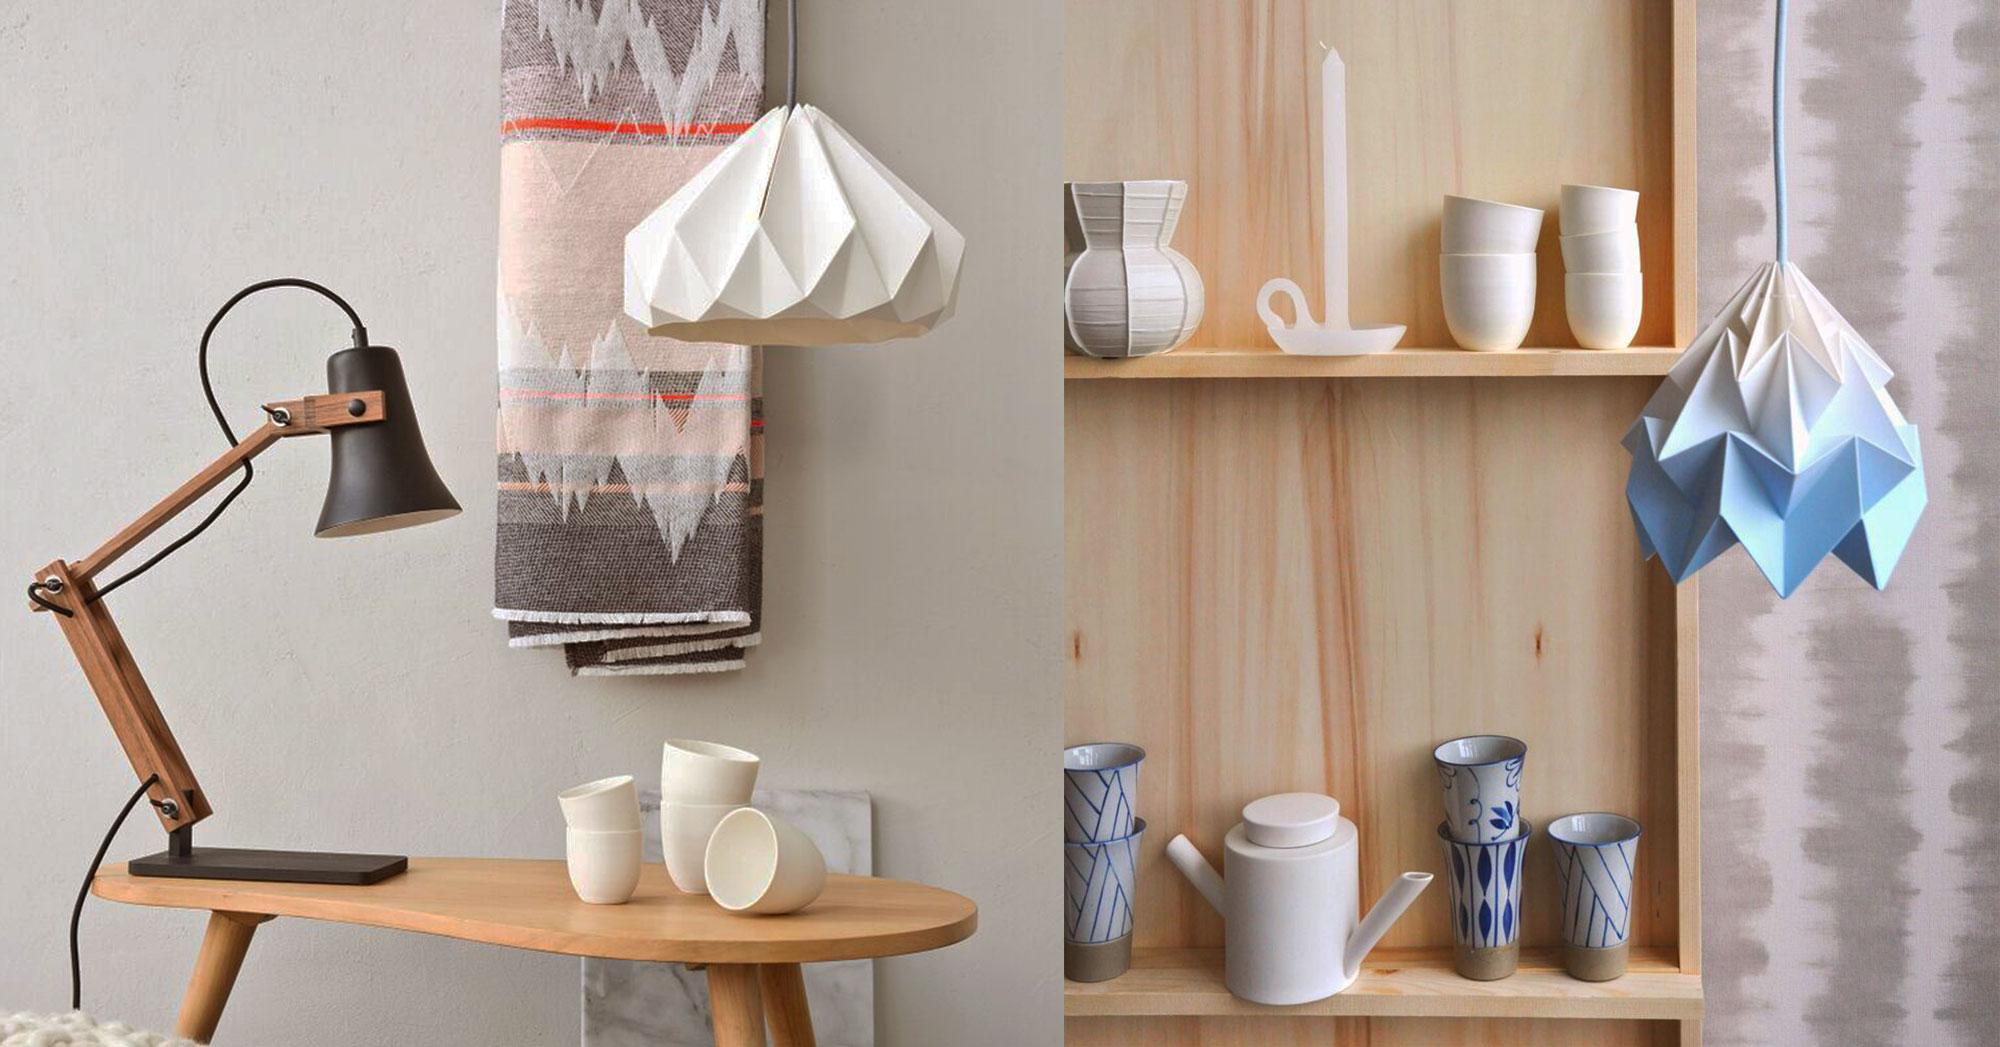 Studio Snowpuppe Lamp : Studio snowpuppe i neue kollektion i